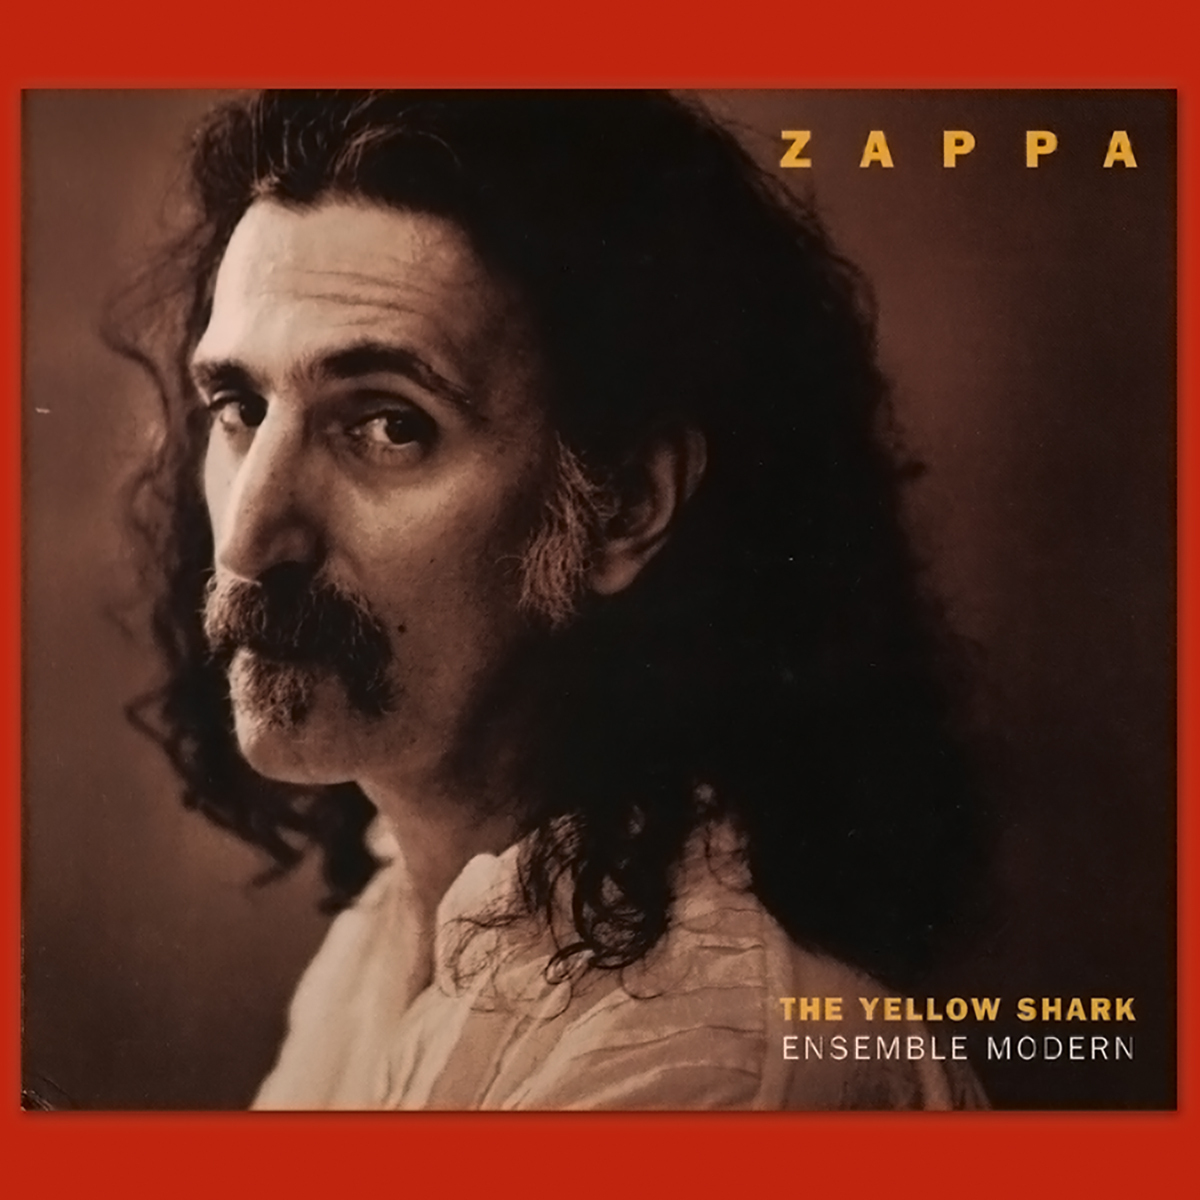 Frank Zappa - The Yellow Shark (1997)